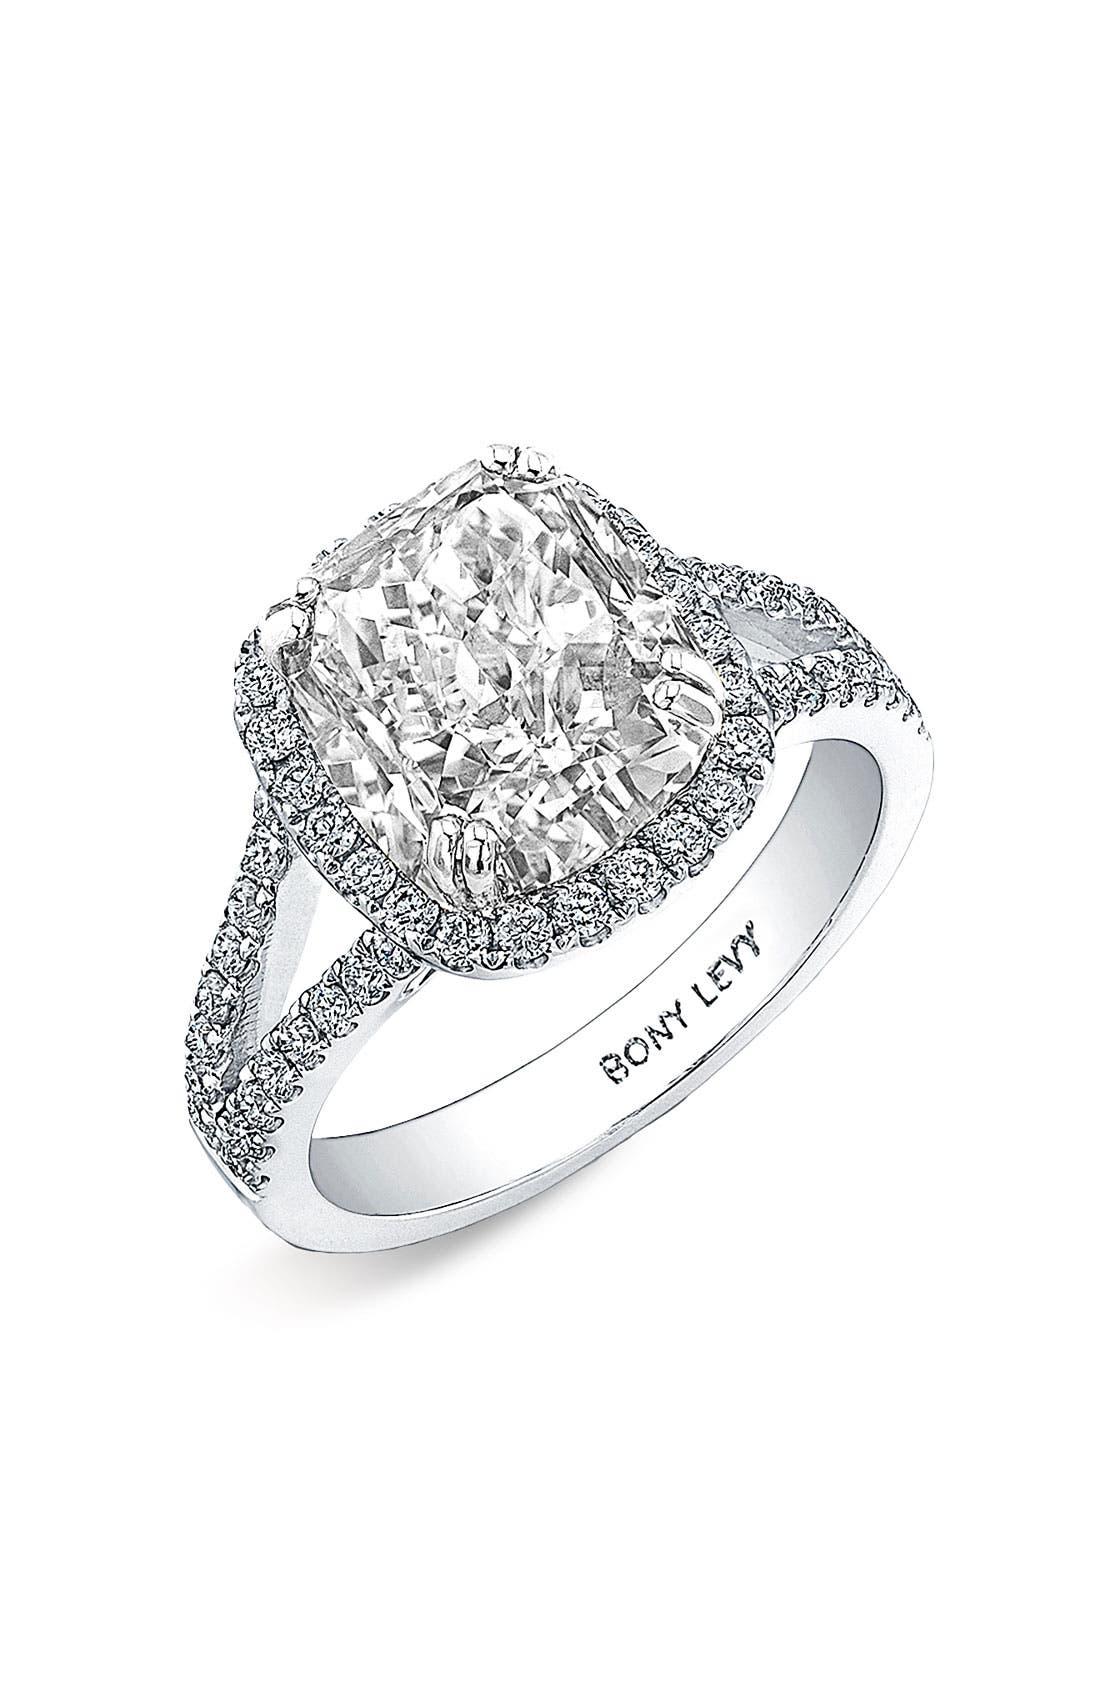 Main Image - Bony Levy Diamond Split Shank Engagement Ring Setting (Nordstrom Exclusive)